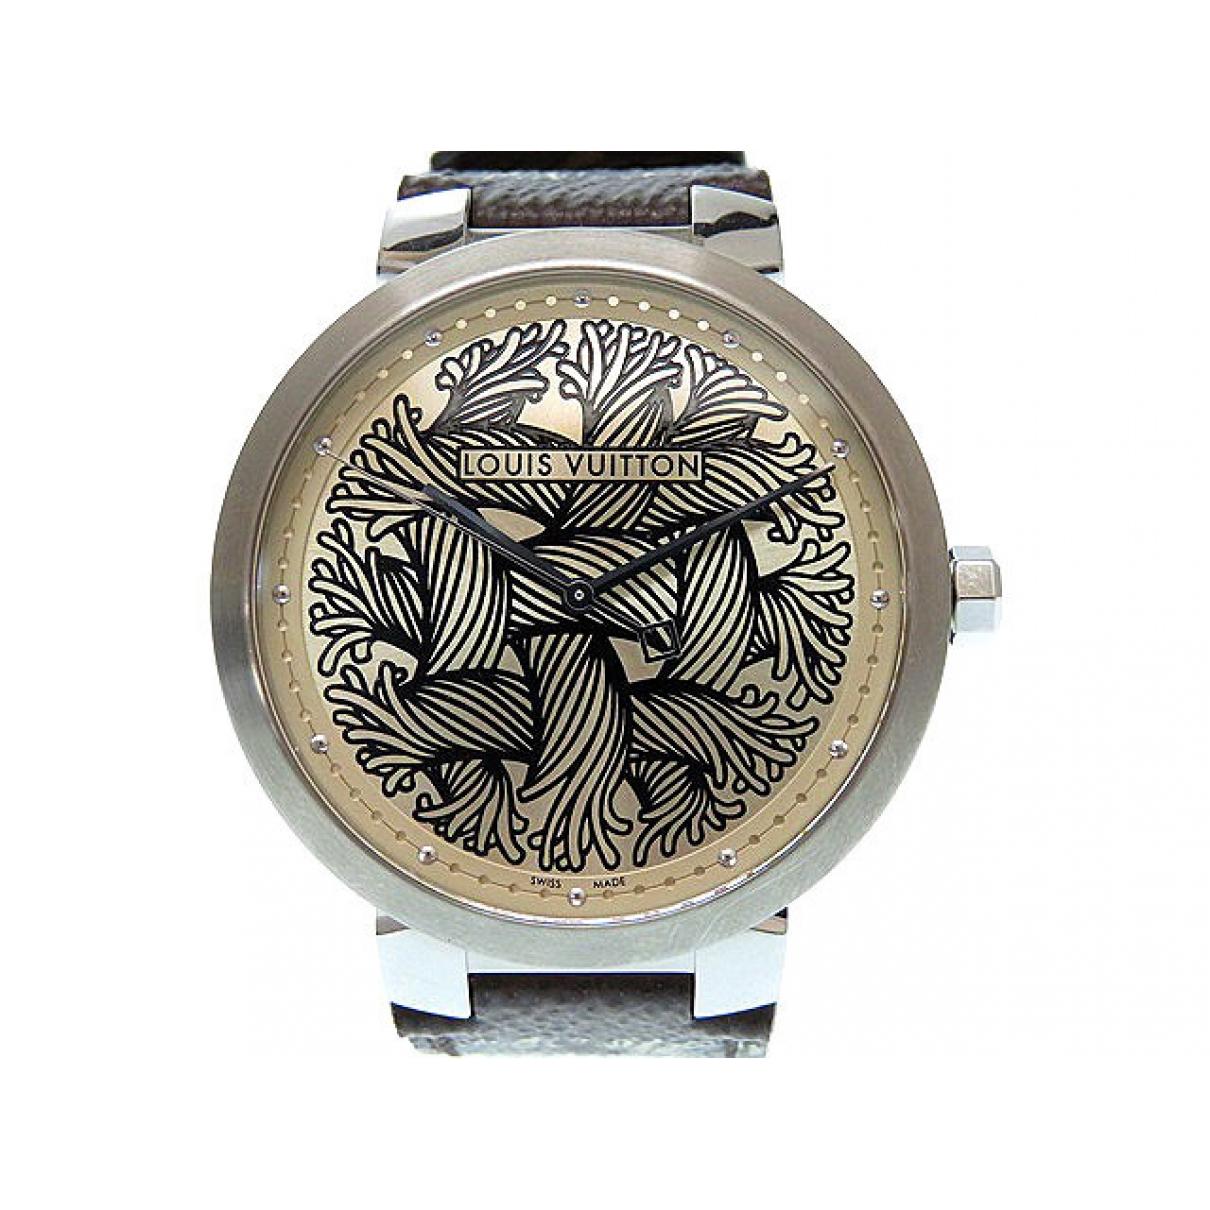 Louis Vuitton Tambour Uhr in Stahl